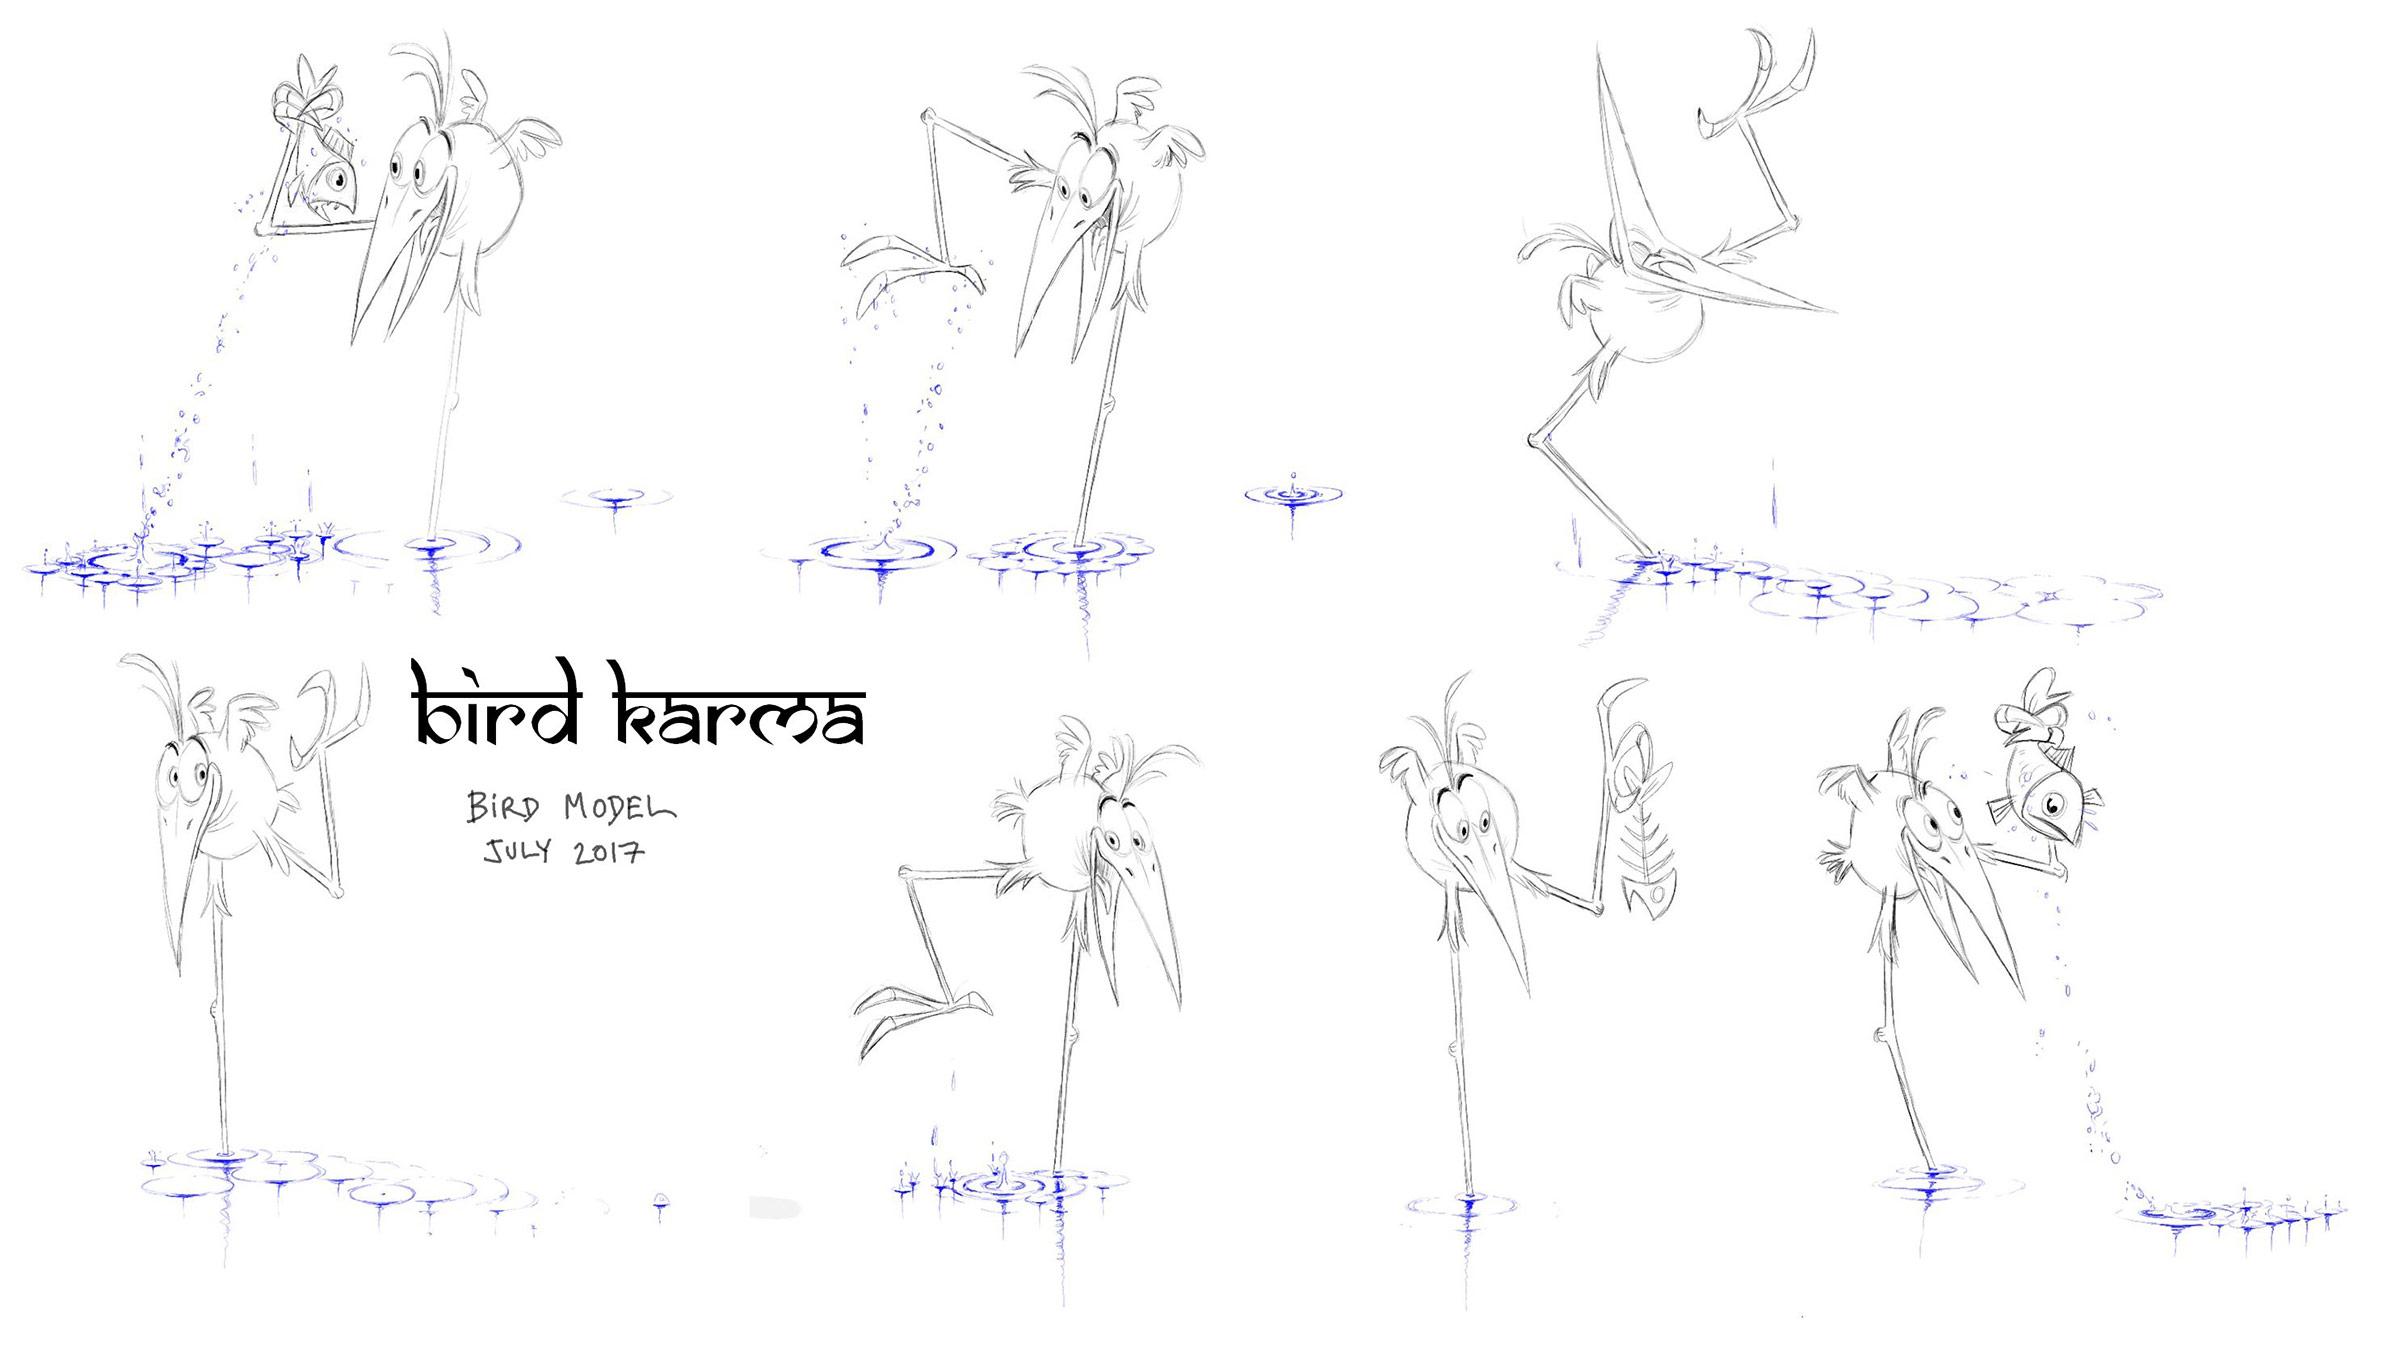 Model sheet drawn by director William Salazar.